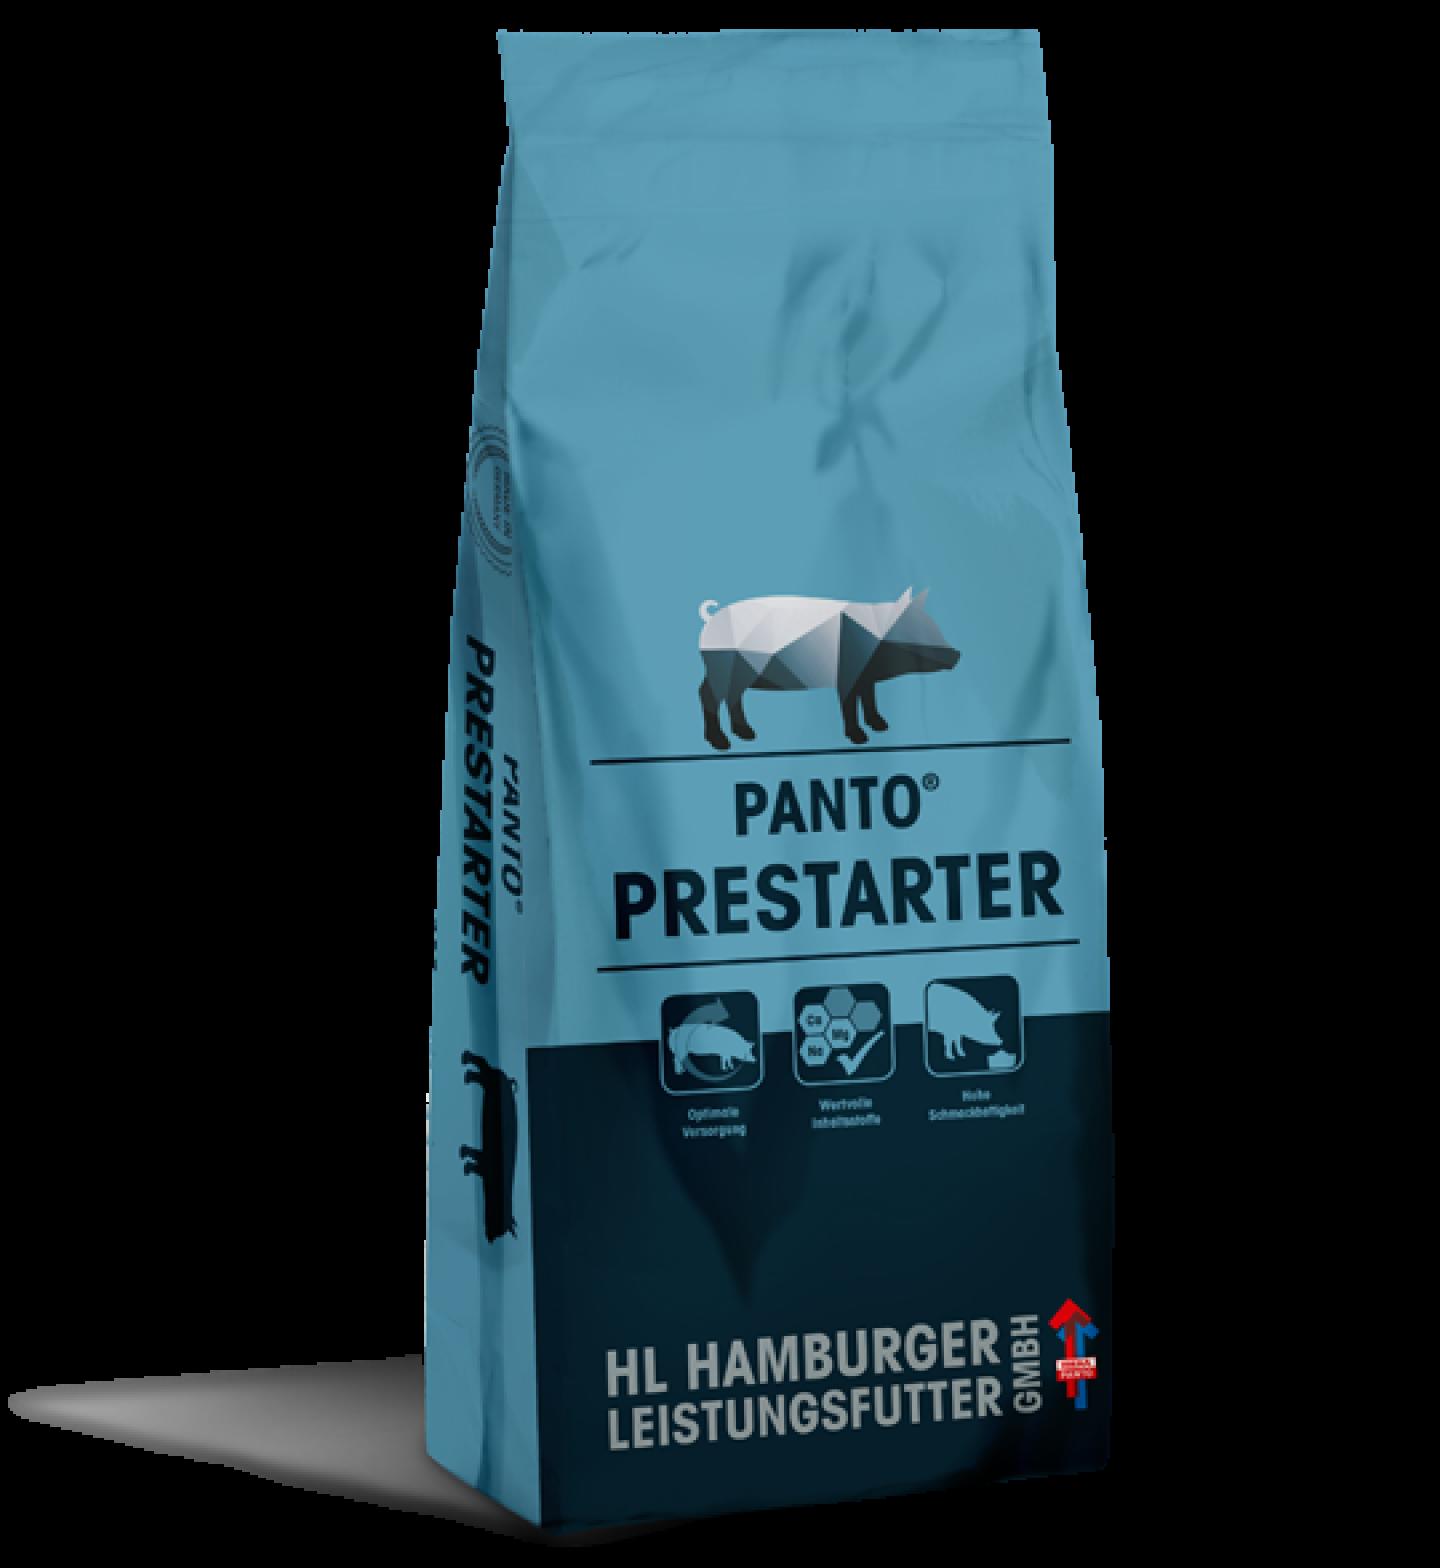 hl-hamburger-leistungsfutter_panto_prestarter